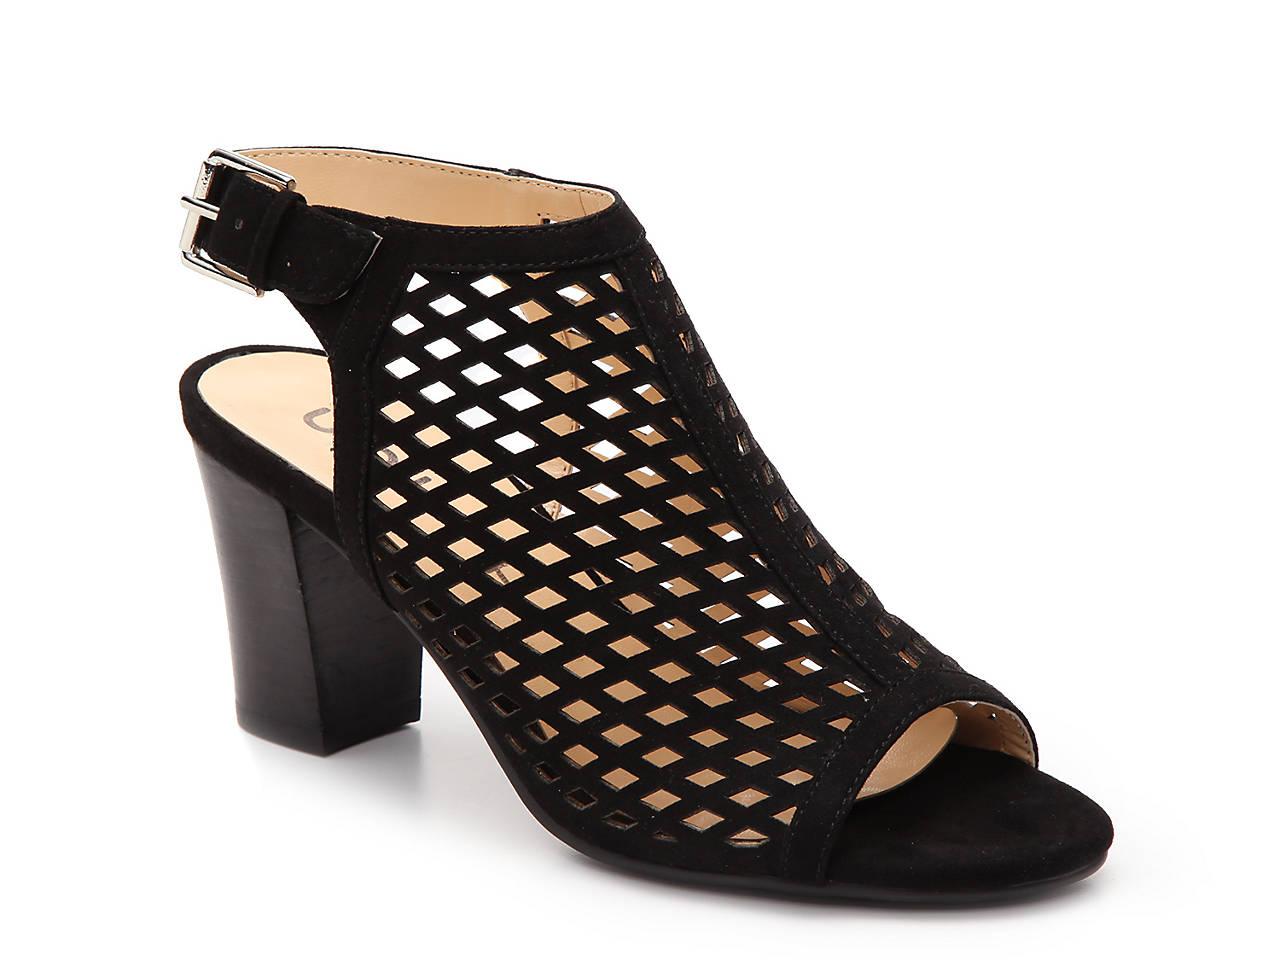 717b0e37805 Unisa Gaila Sandal Women s Shoes